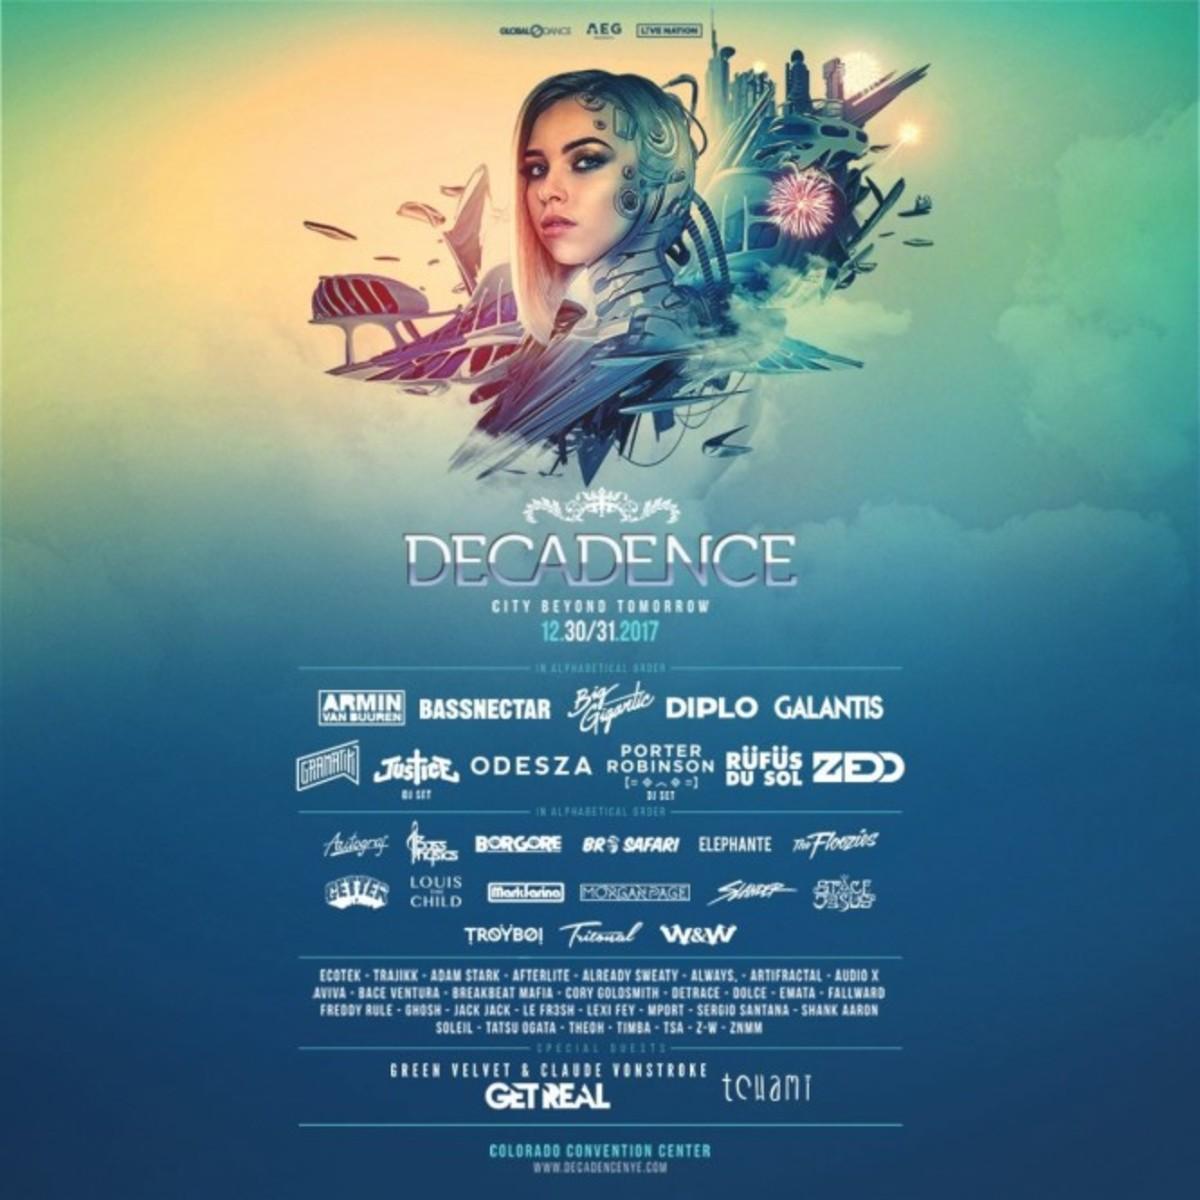 Decadence 2017 Lineup